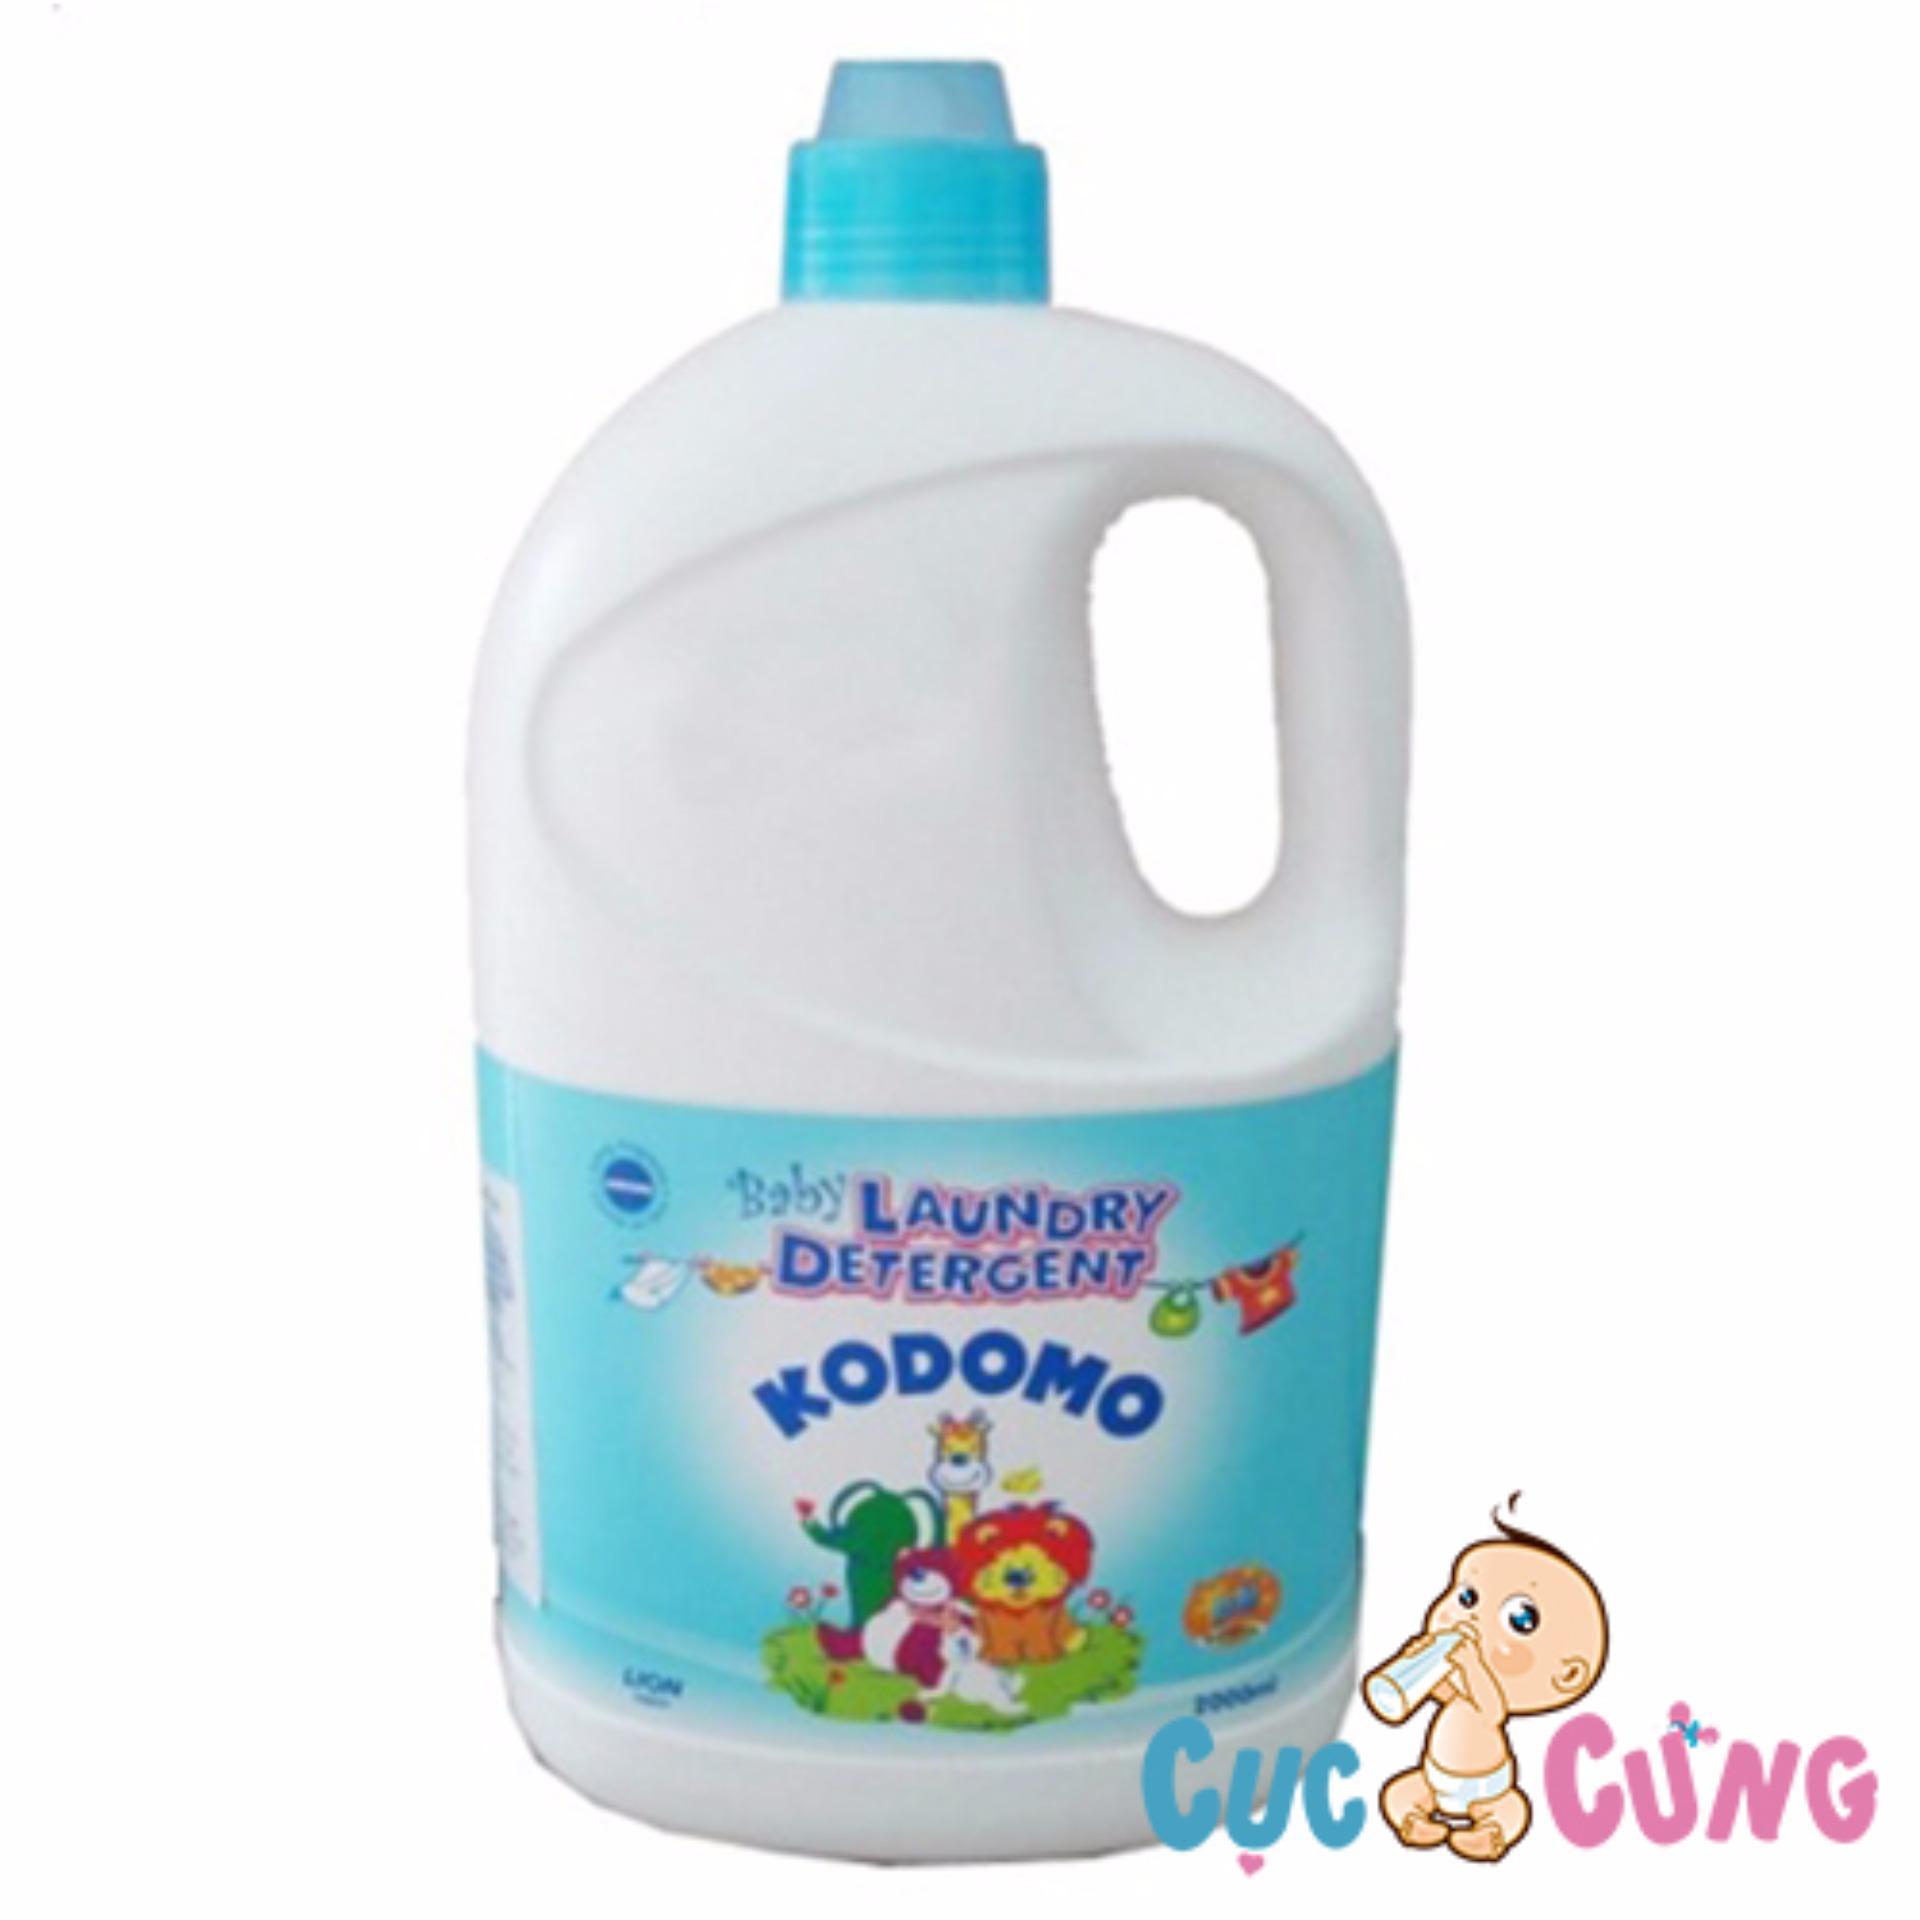 Nước giặt tẩy KoDoMo 2000ml Thái Lan - chai